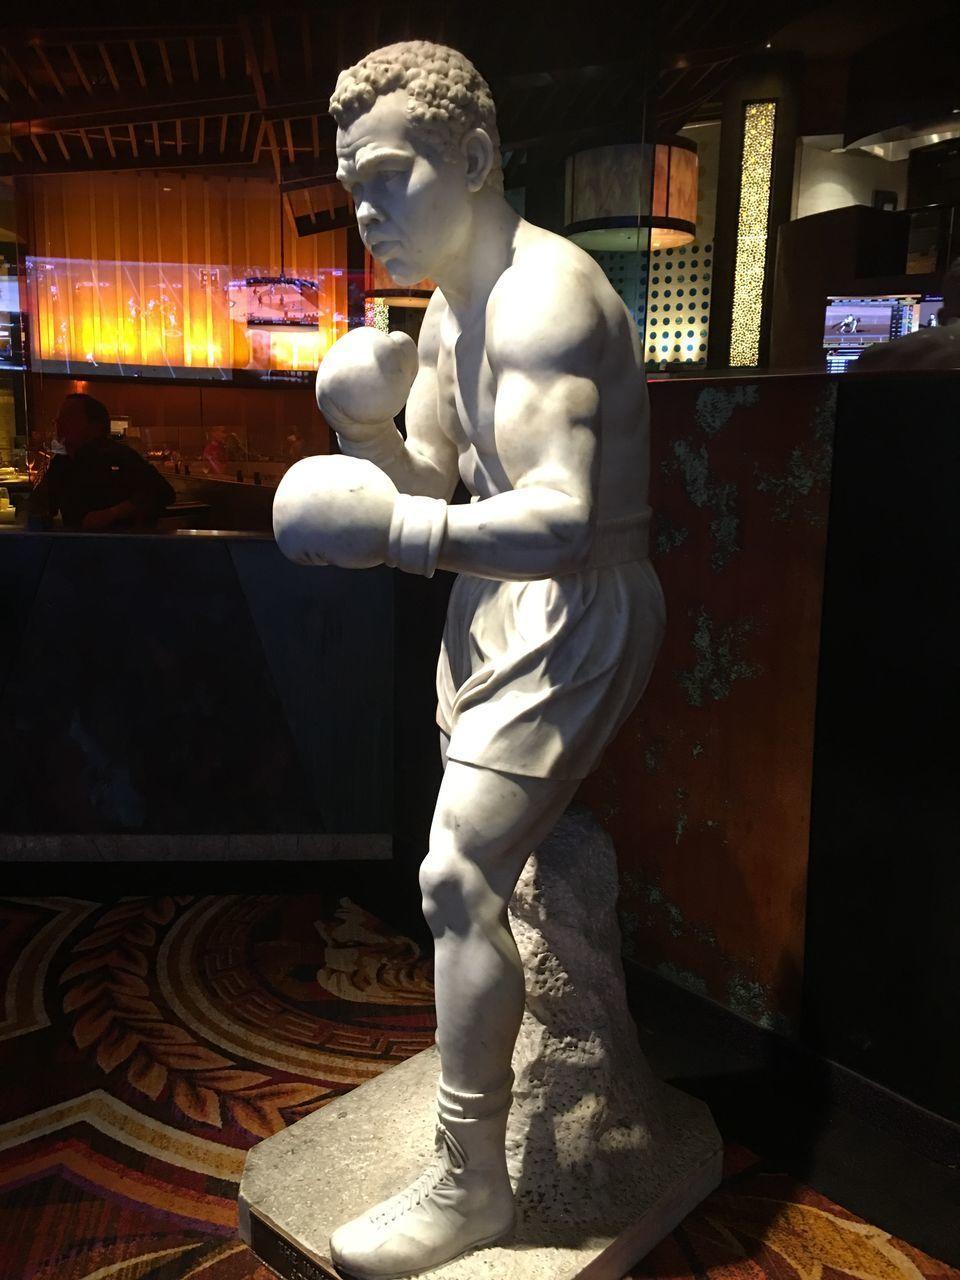 statue, human representation, sculpture, male likeness, art and craft, spirituality, religion, indoors, illuminated, night, no people